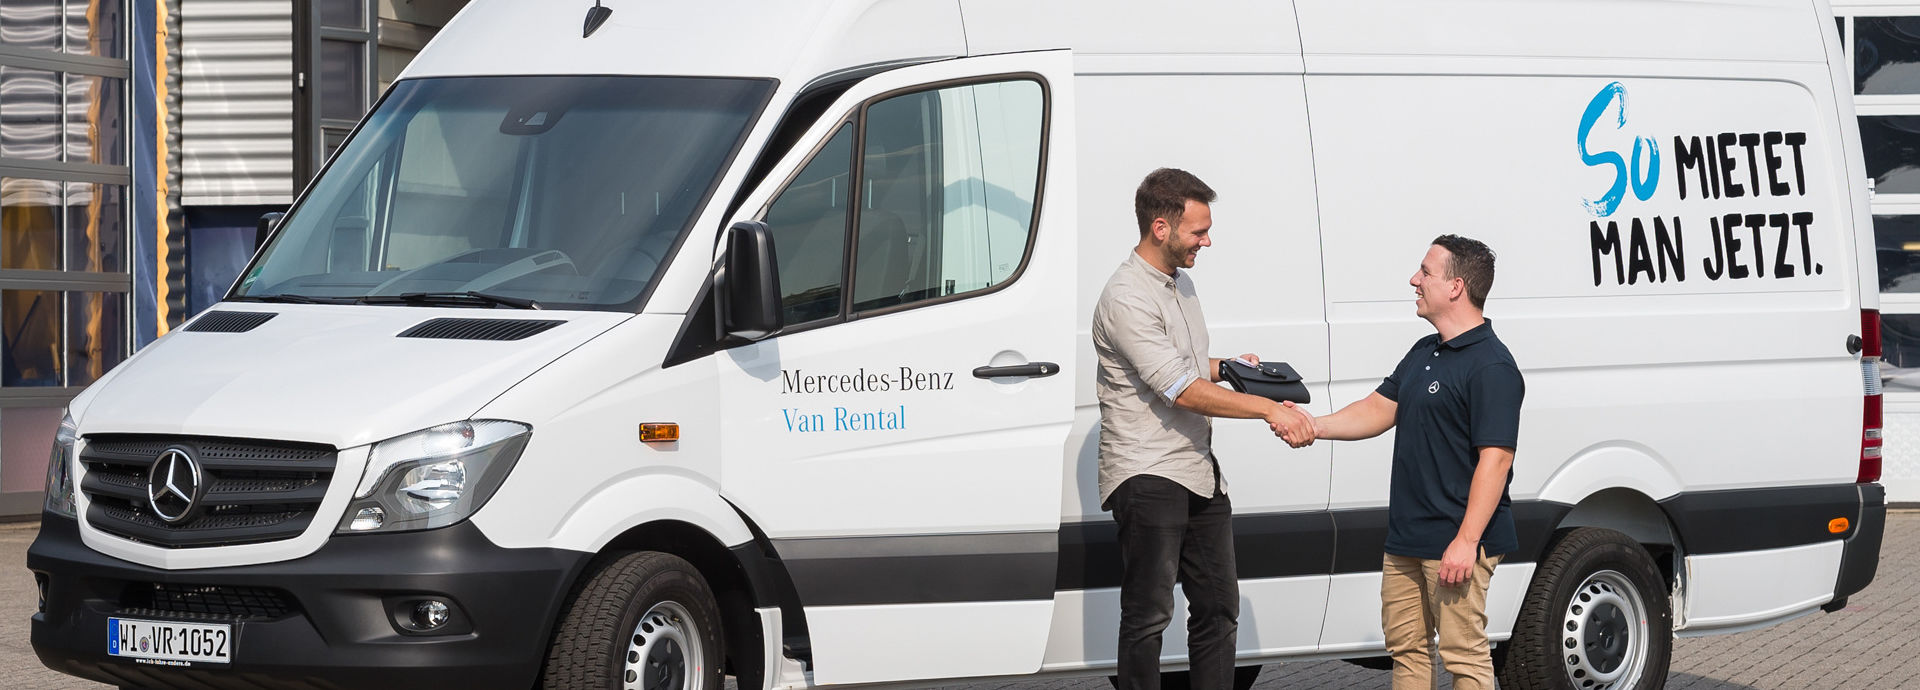 transporter vermietung leipzig fabulous transporter vermietung leipzig with transporter. Black Bedroom Furniture Sets. Home Design Ideas